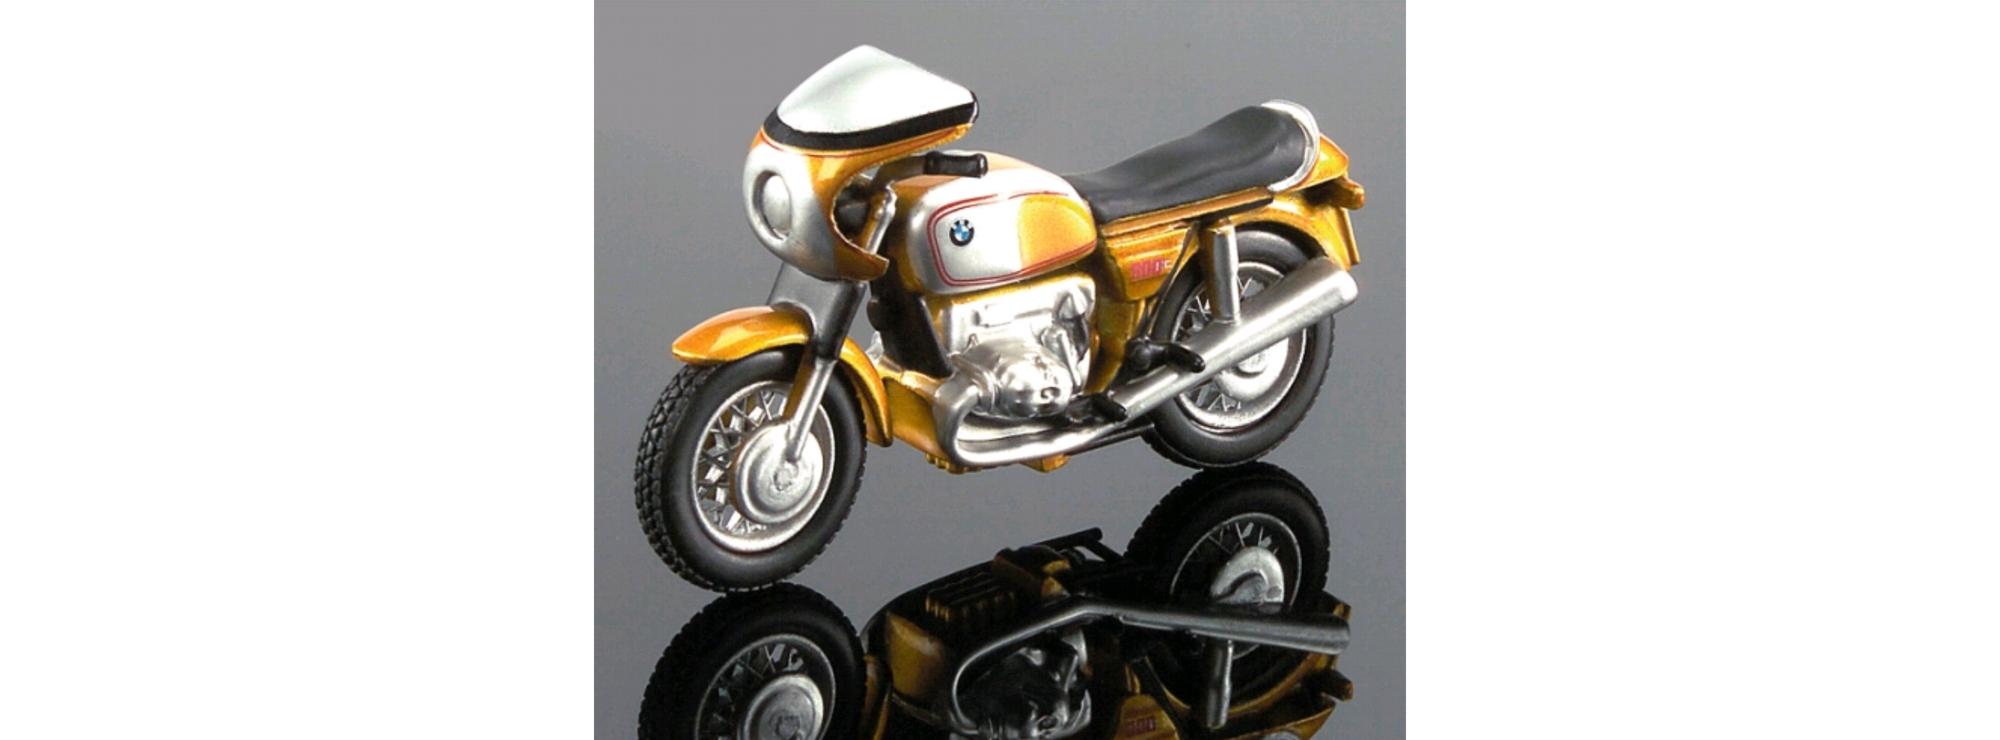 Ausverkauft Schuco Piccolo 05325 Bmw R90 S Motorradmodell 1 43